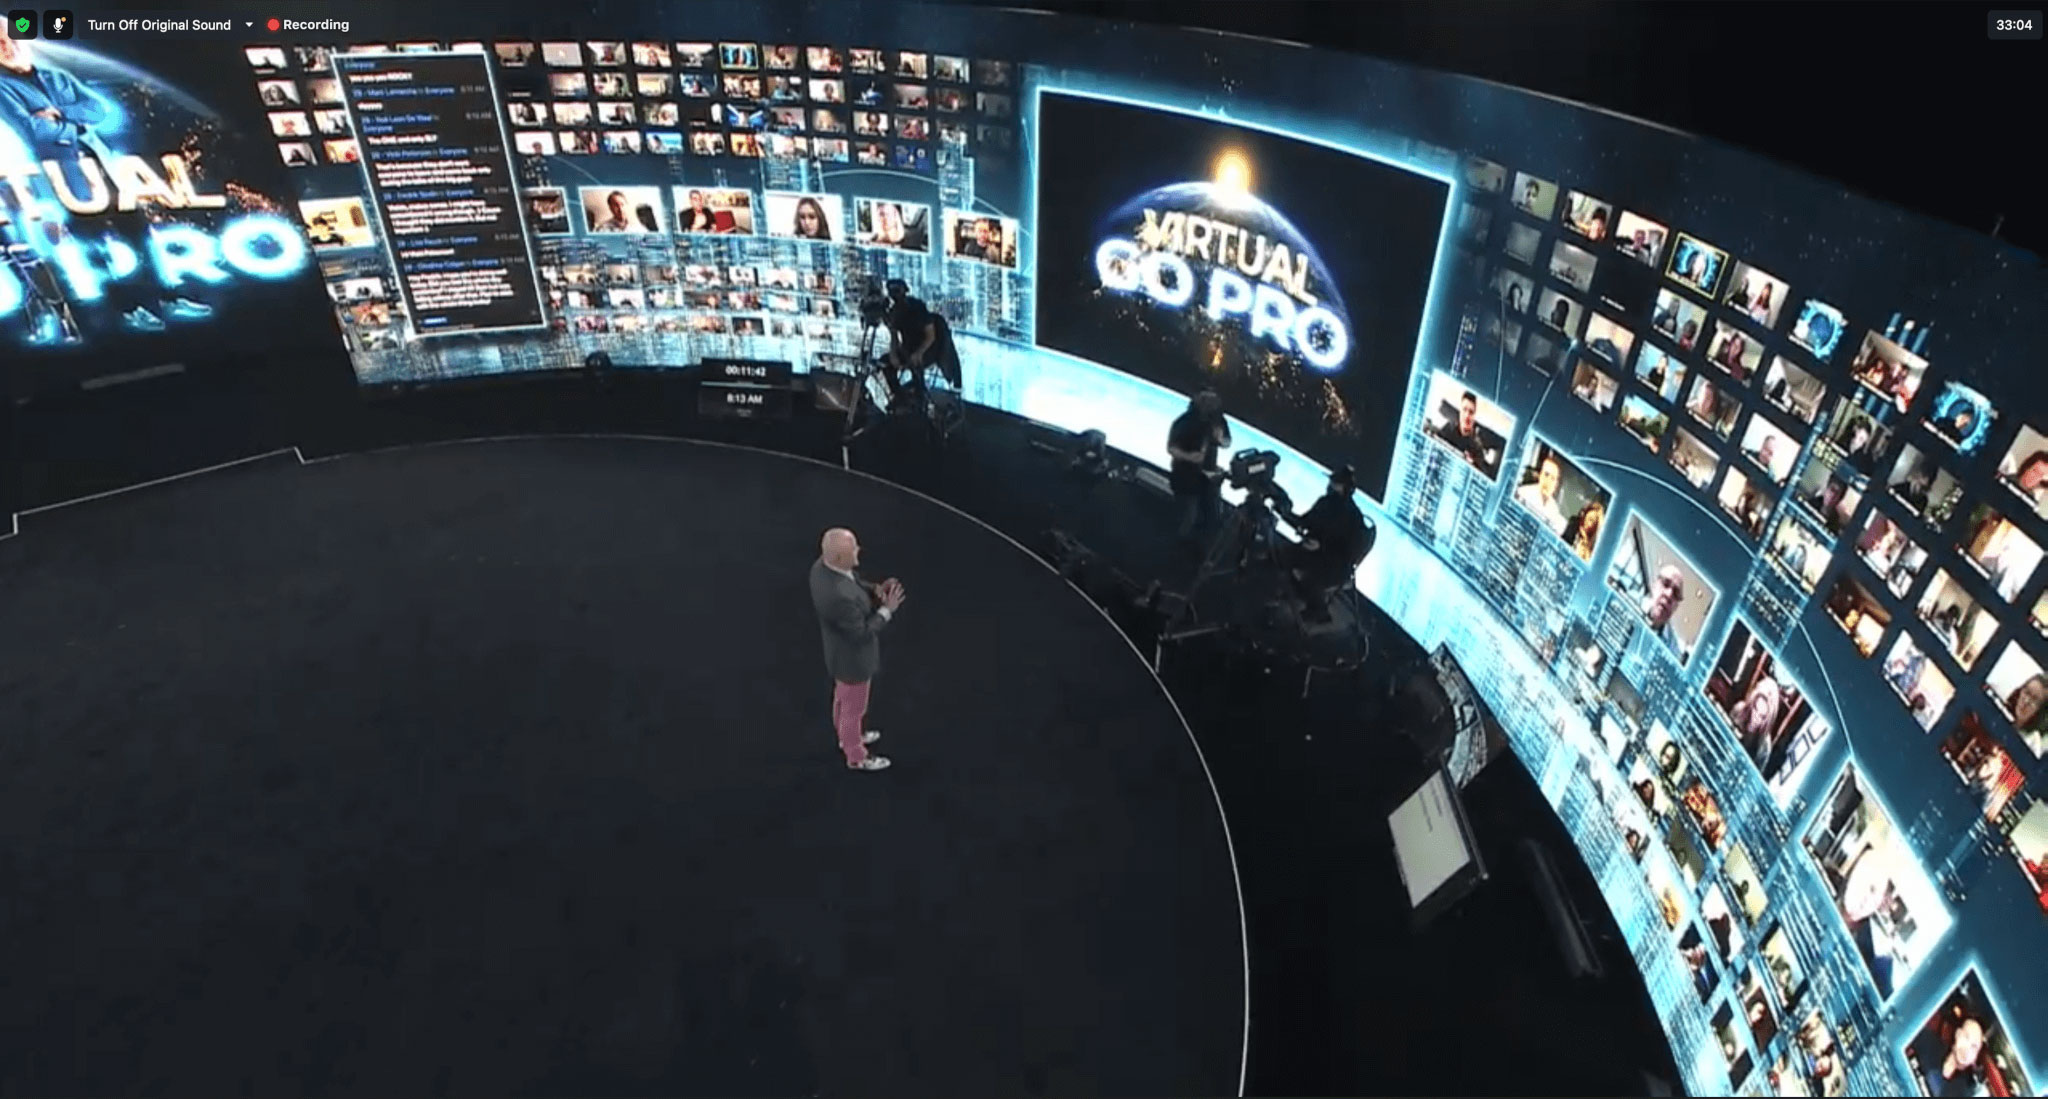 Immersive Design Studios creates studio for virtual and hybrid events